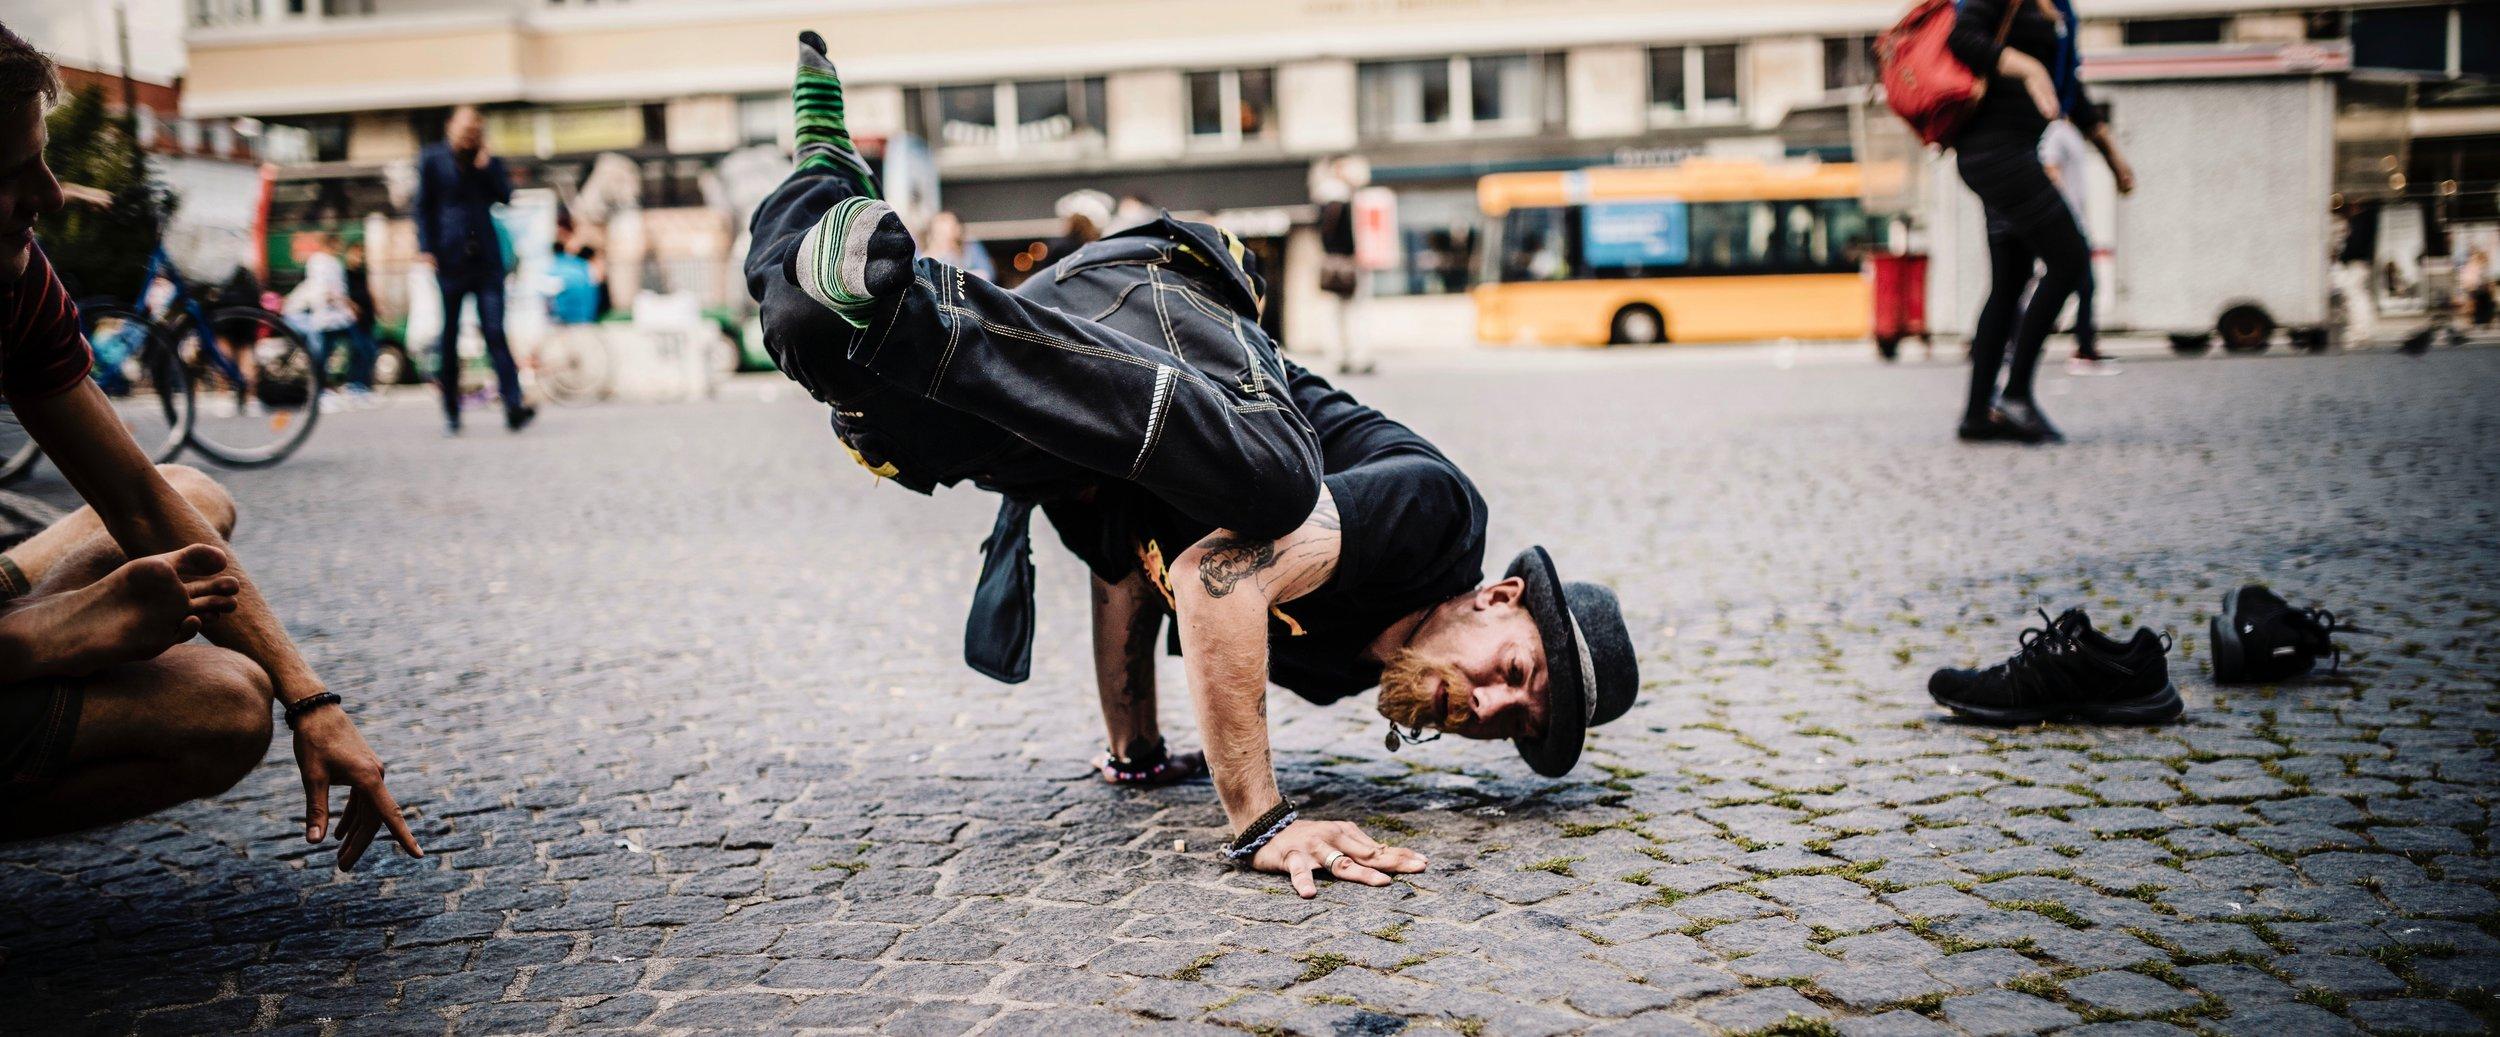 The-Yoga-Flat-Christianshavn-donation-class-Homeless-projekt-Hjemløs